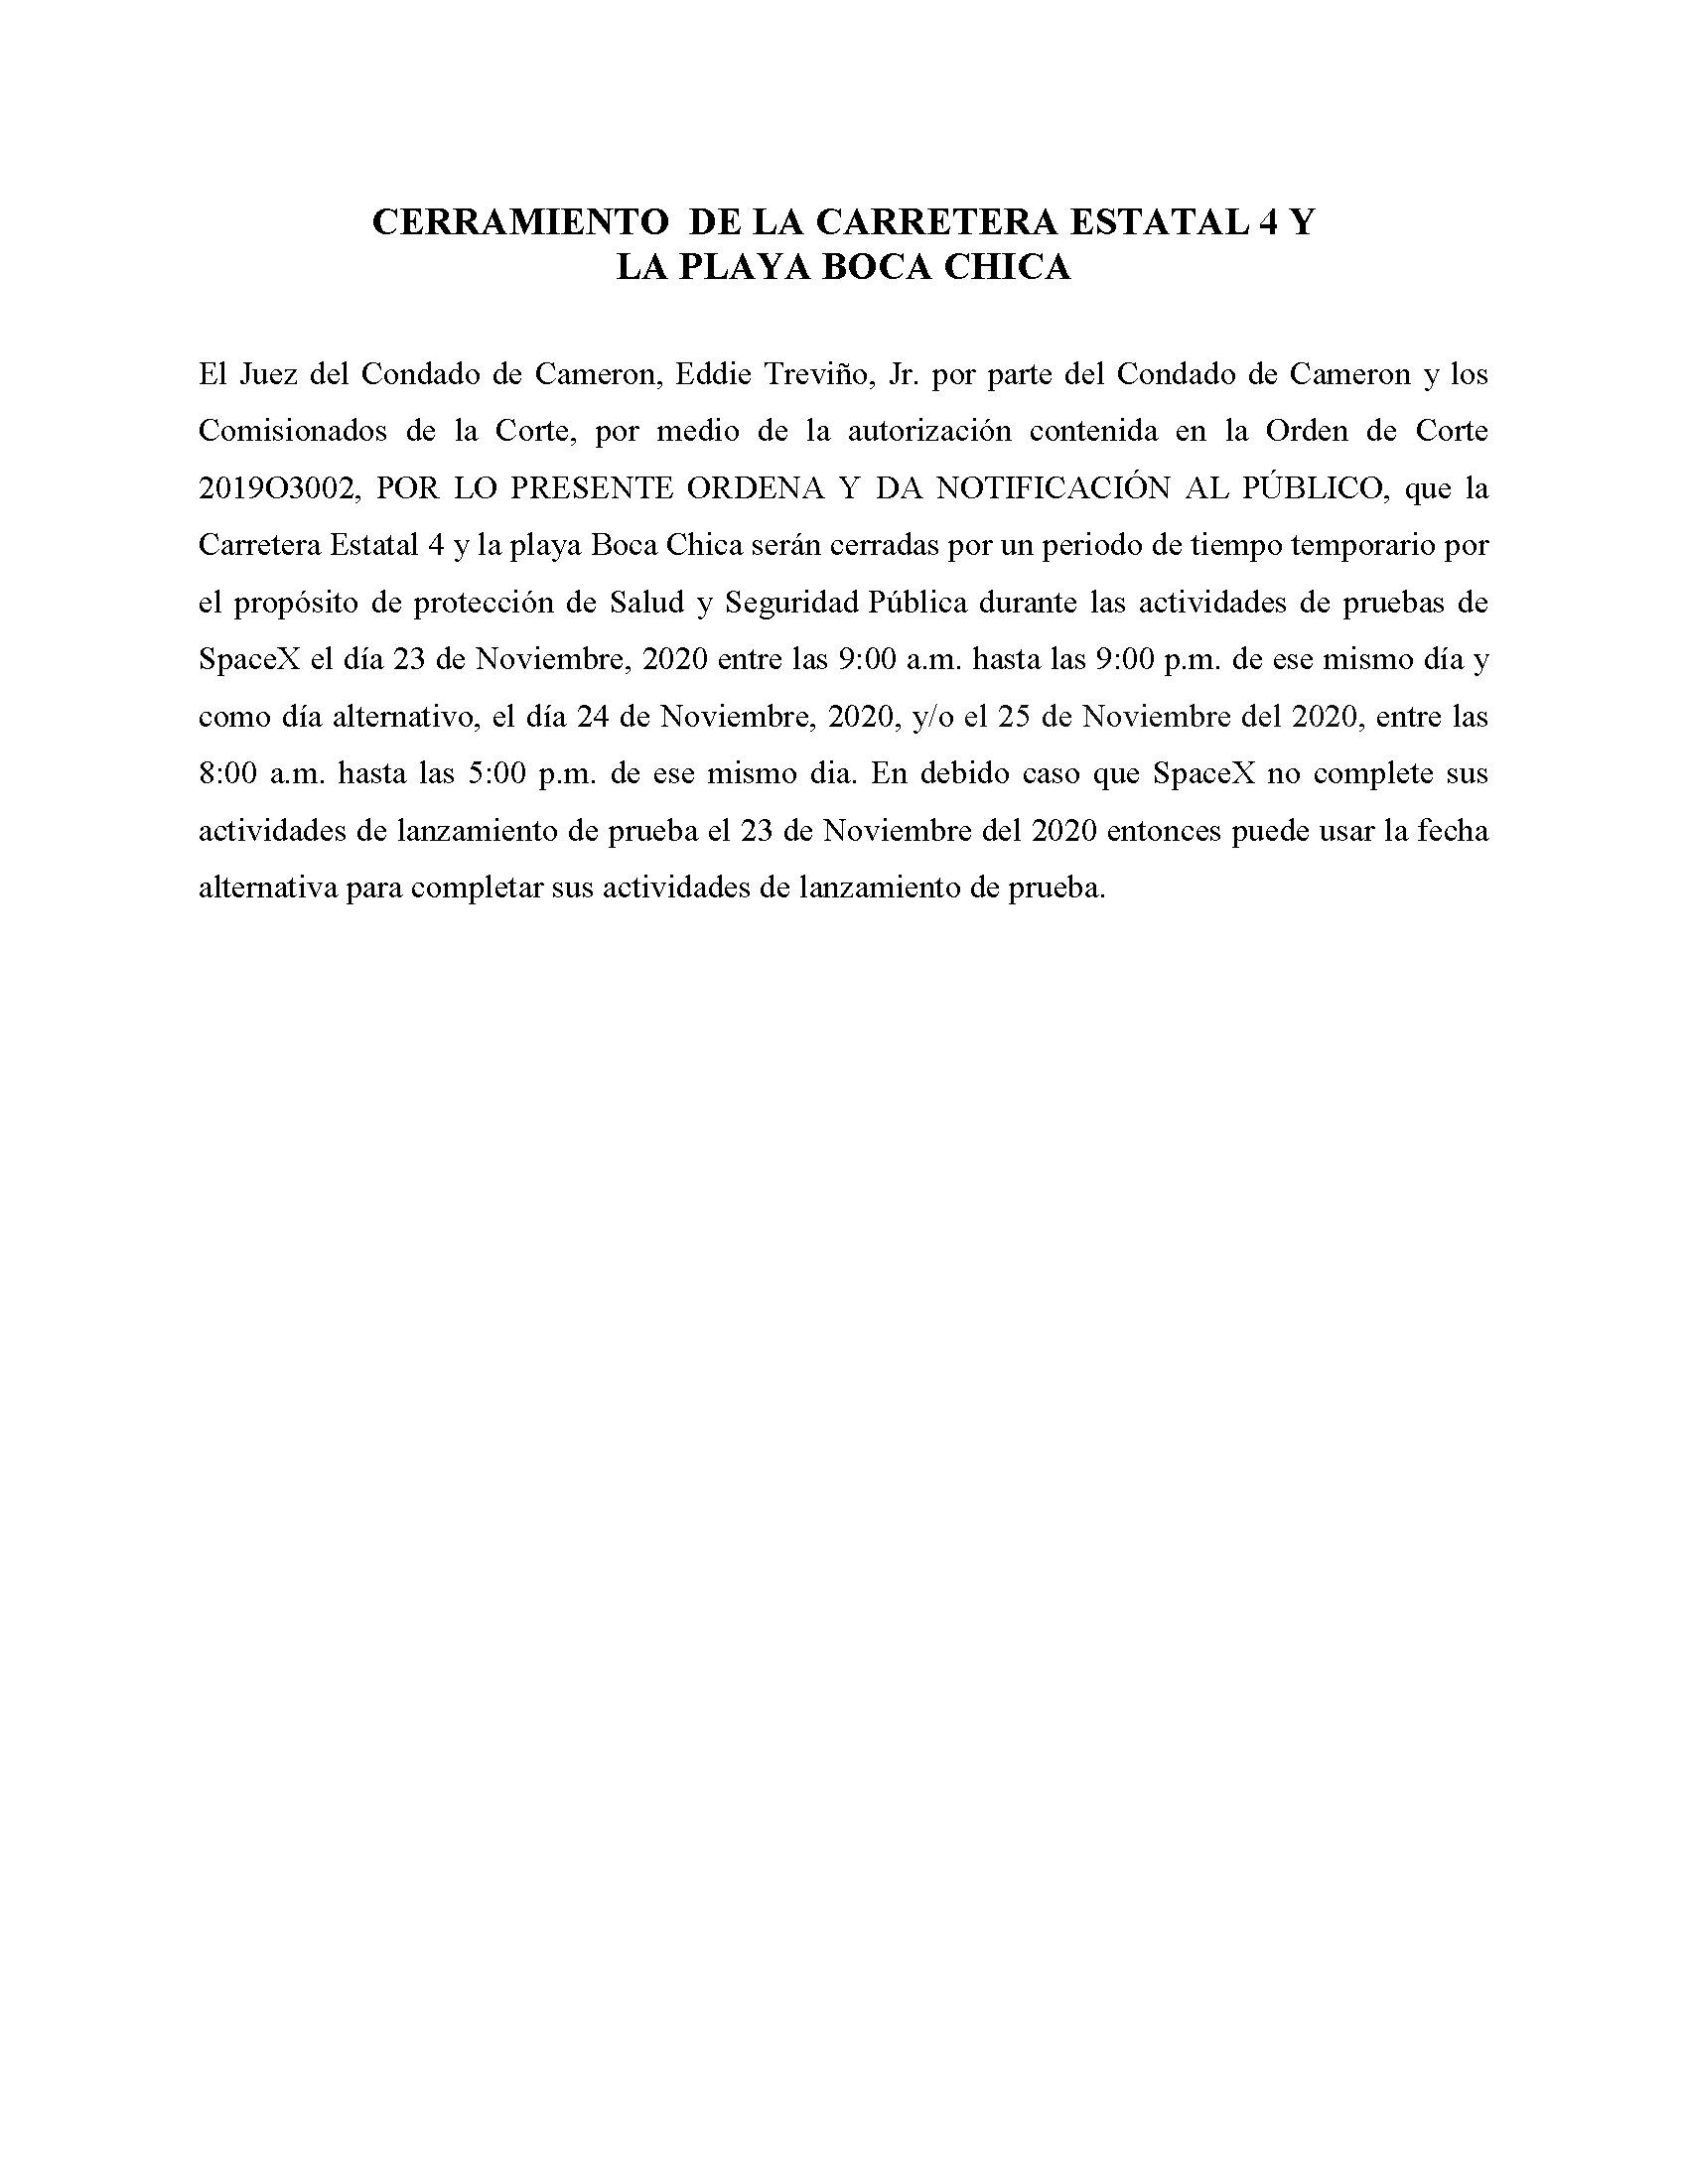 ORDER.CLOSURE OF HIGHWAY 4 Y LA PLAYA BOCA CHICA.SPANISH.11.23.20